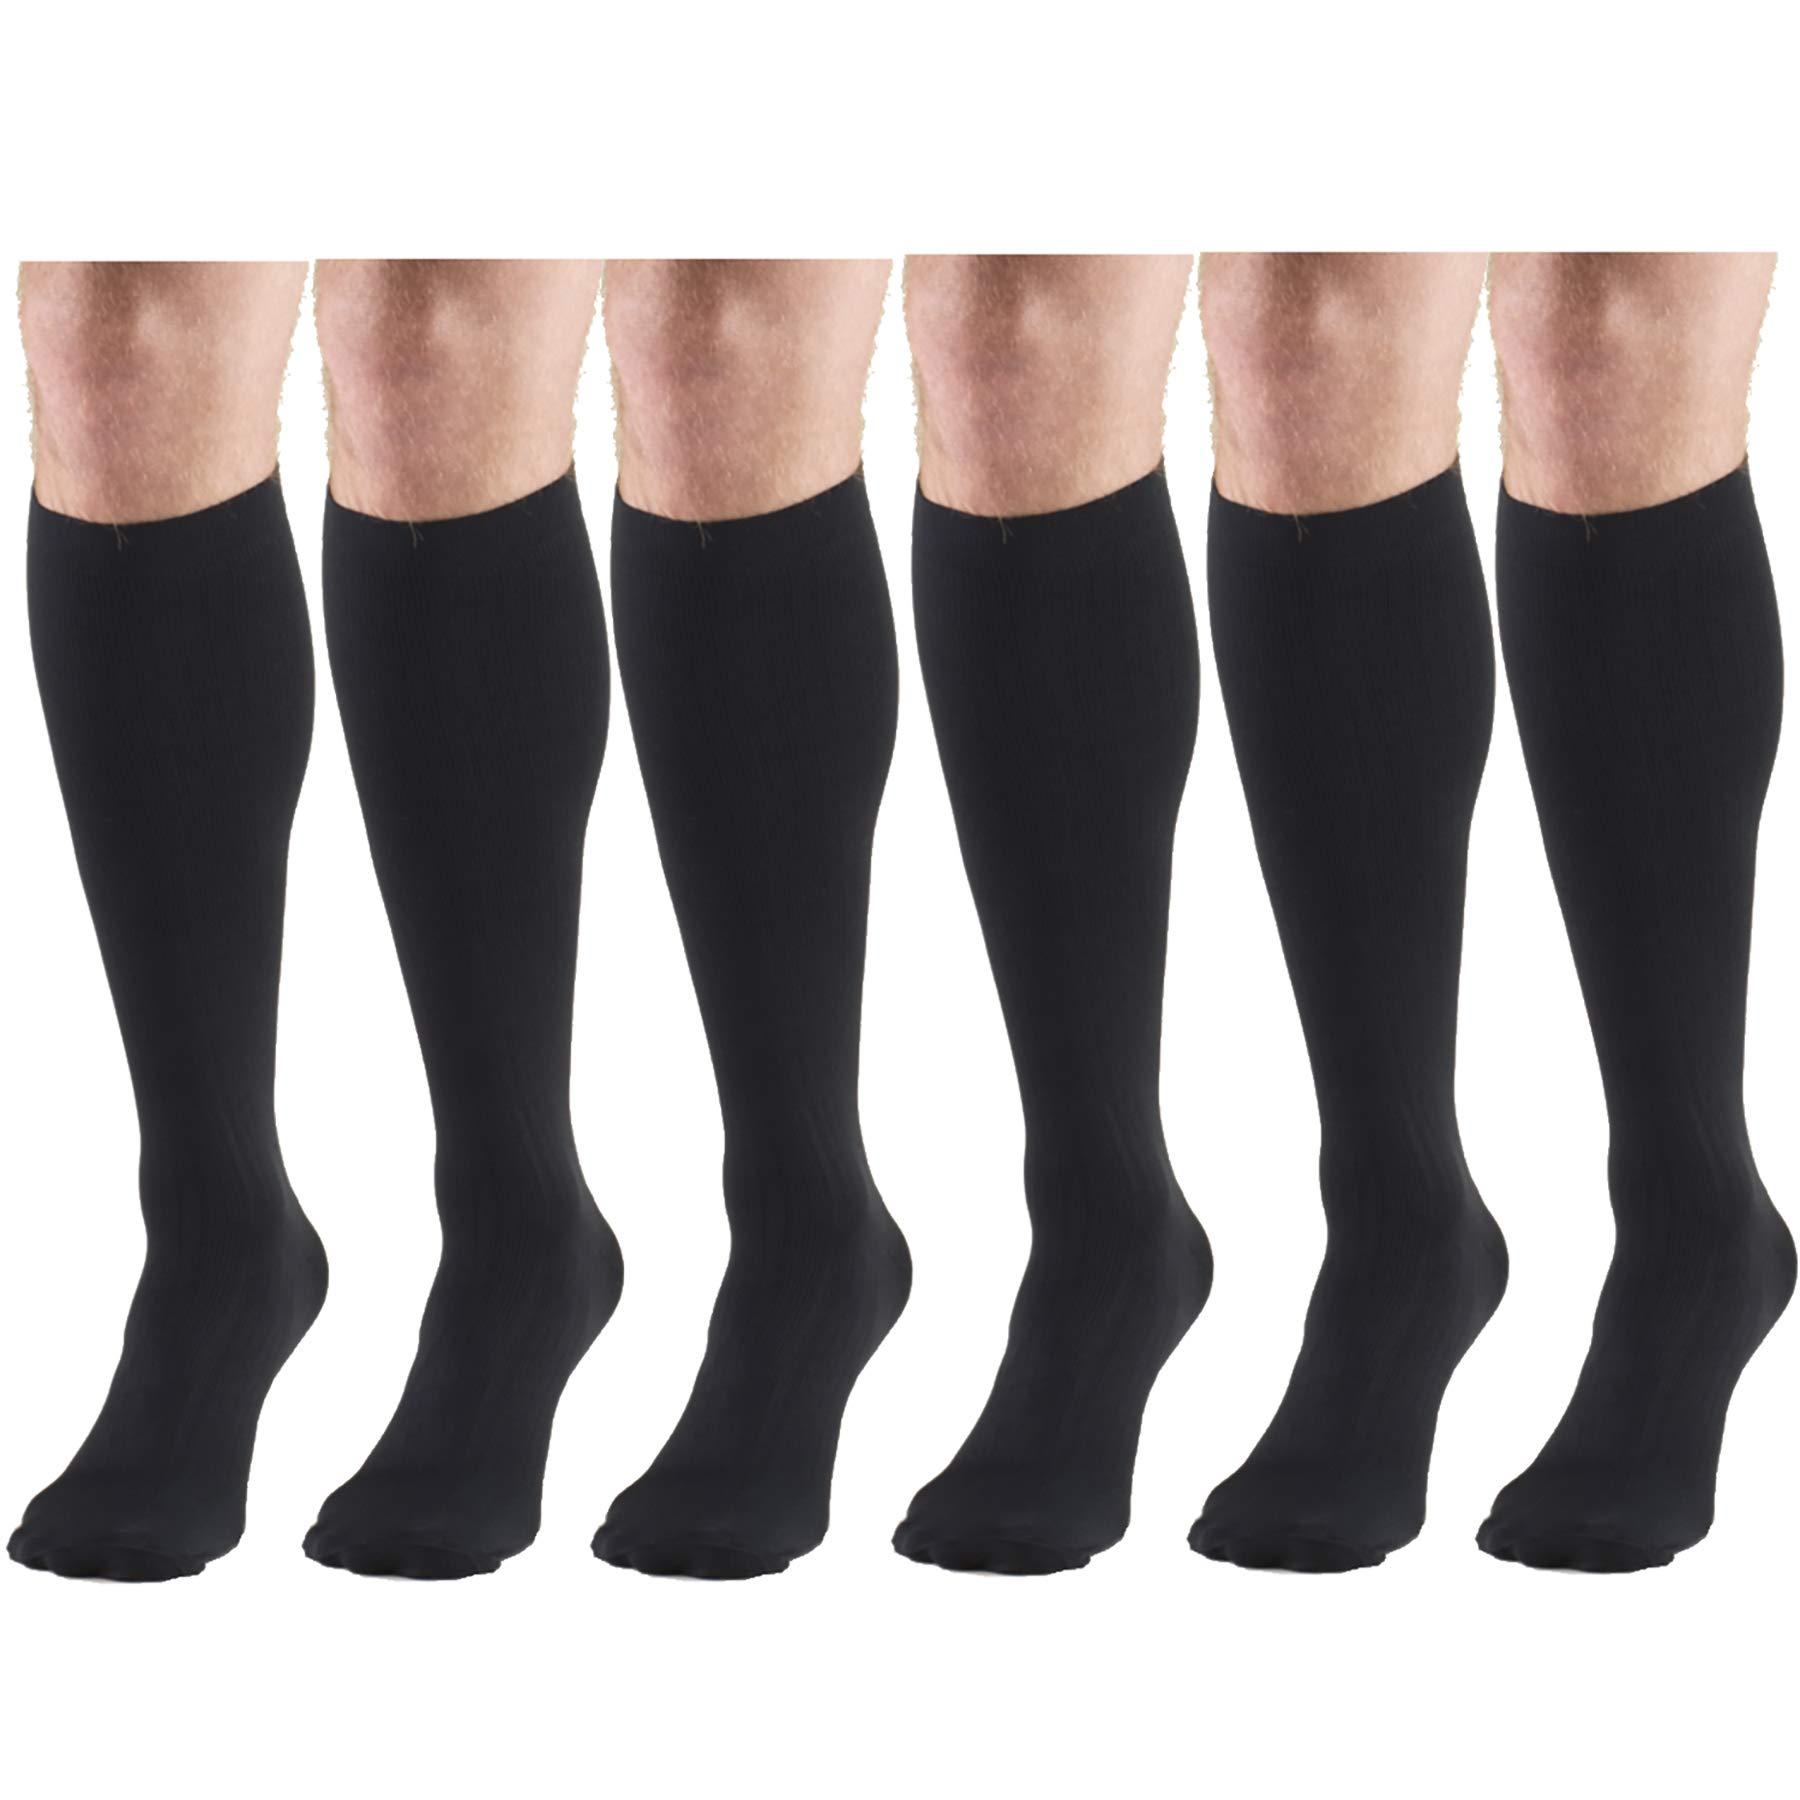 Compression Socks, 30-40 mmHg, Men's Dress Socks, Knee High Over Calf Length Black X-Large (6 Pairs)